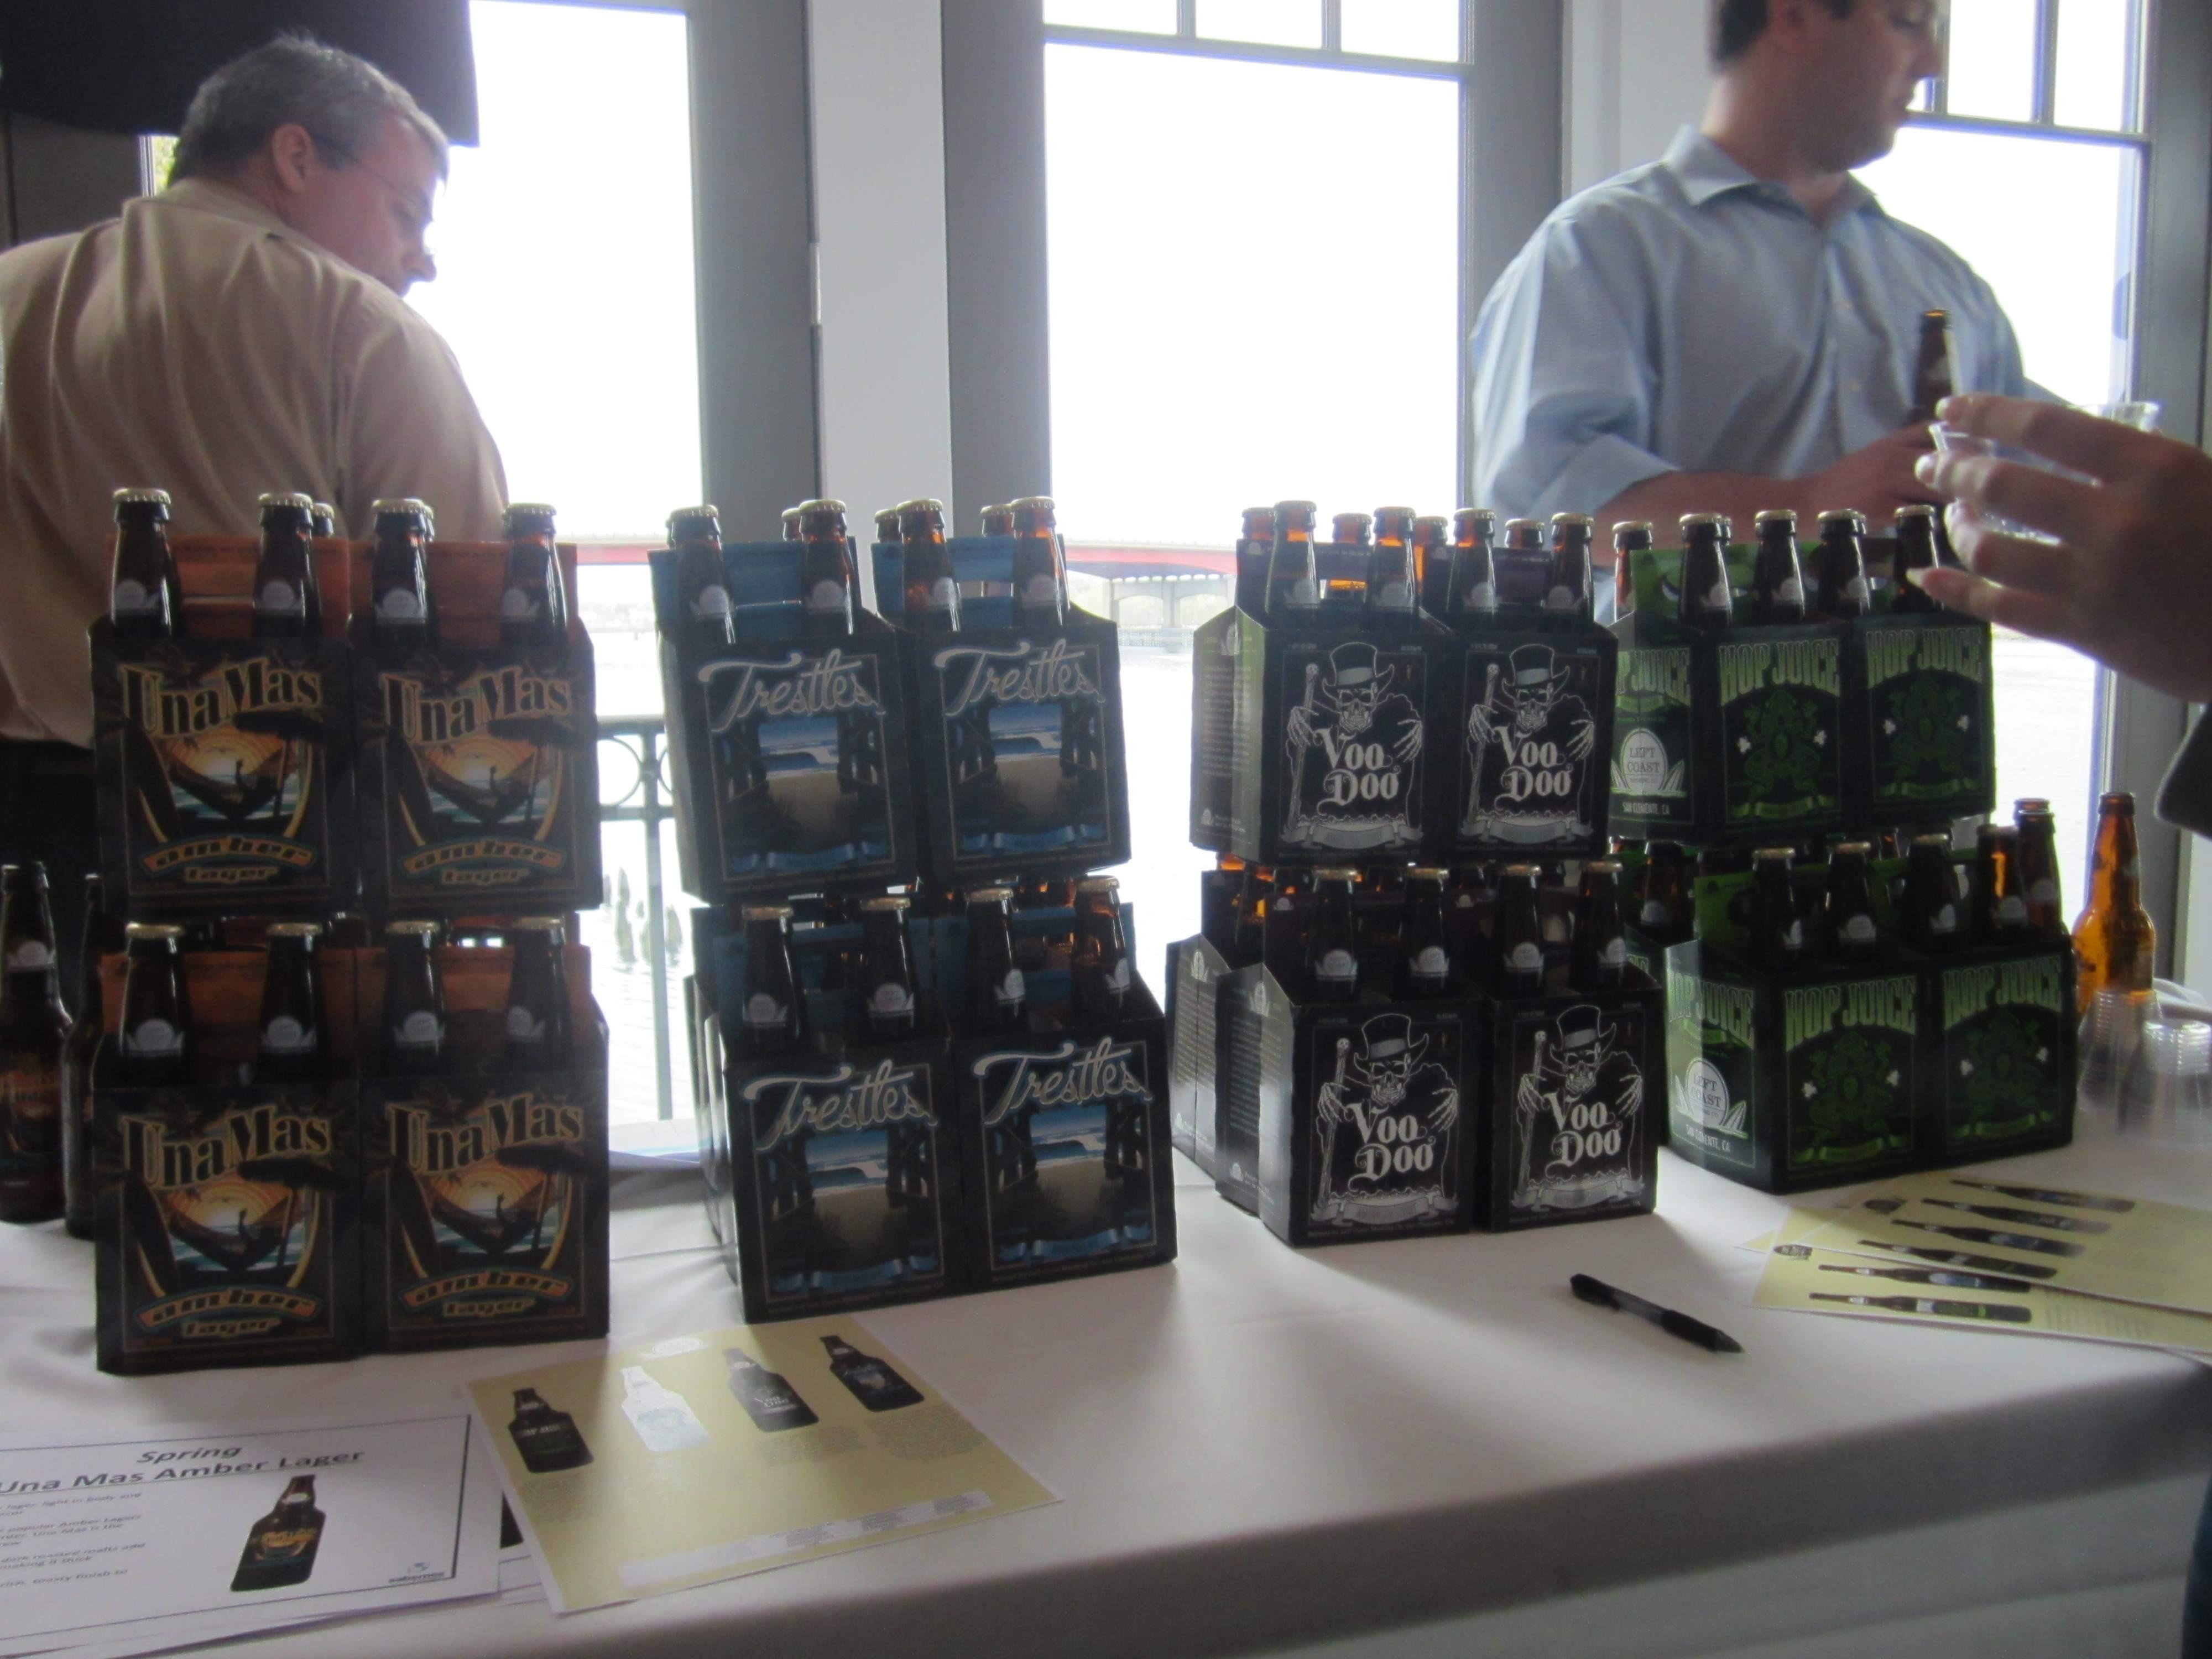 Johnson Brothers Hosts Craft Beer Tasting